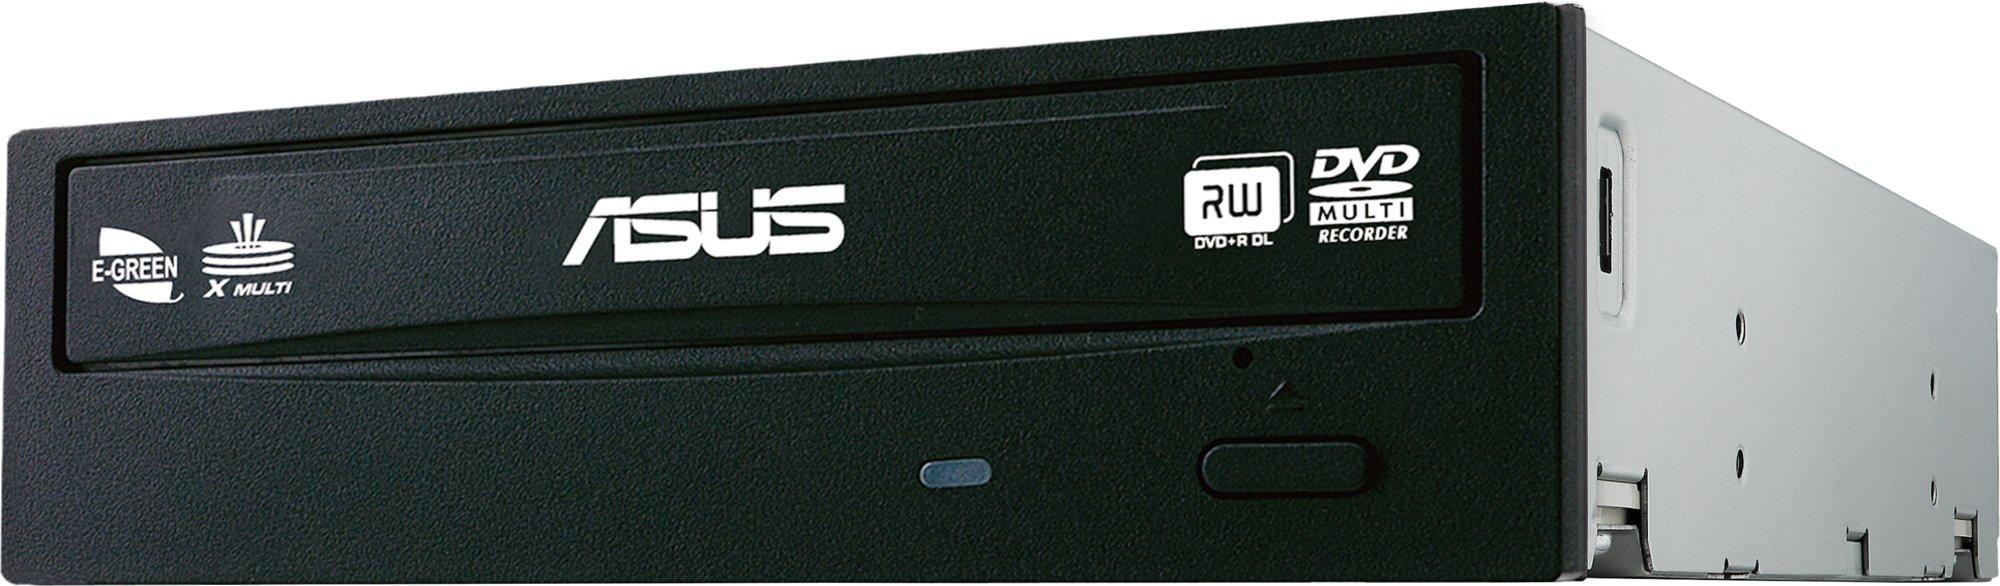 ASUS DVD Writer DRW-24F1MT Black Bulk